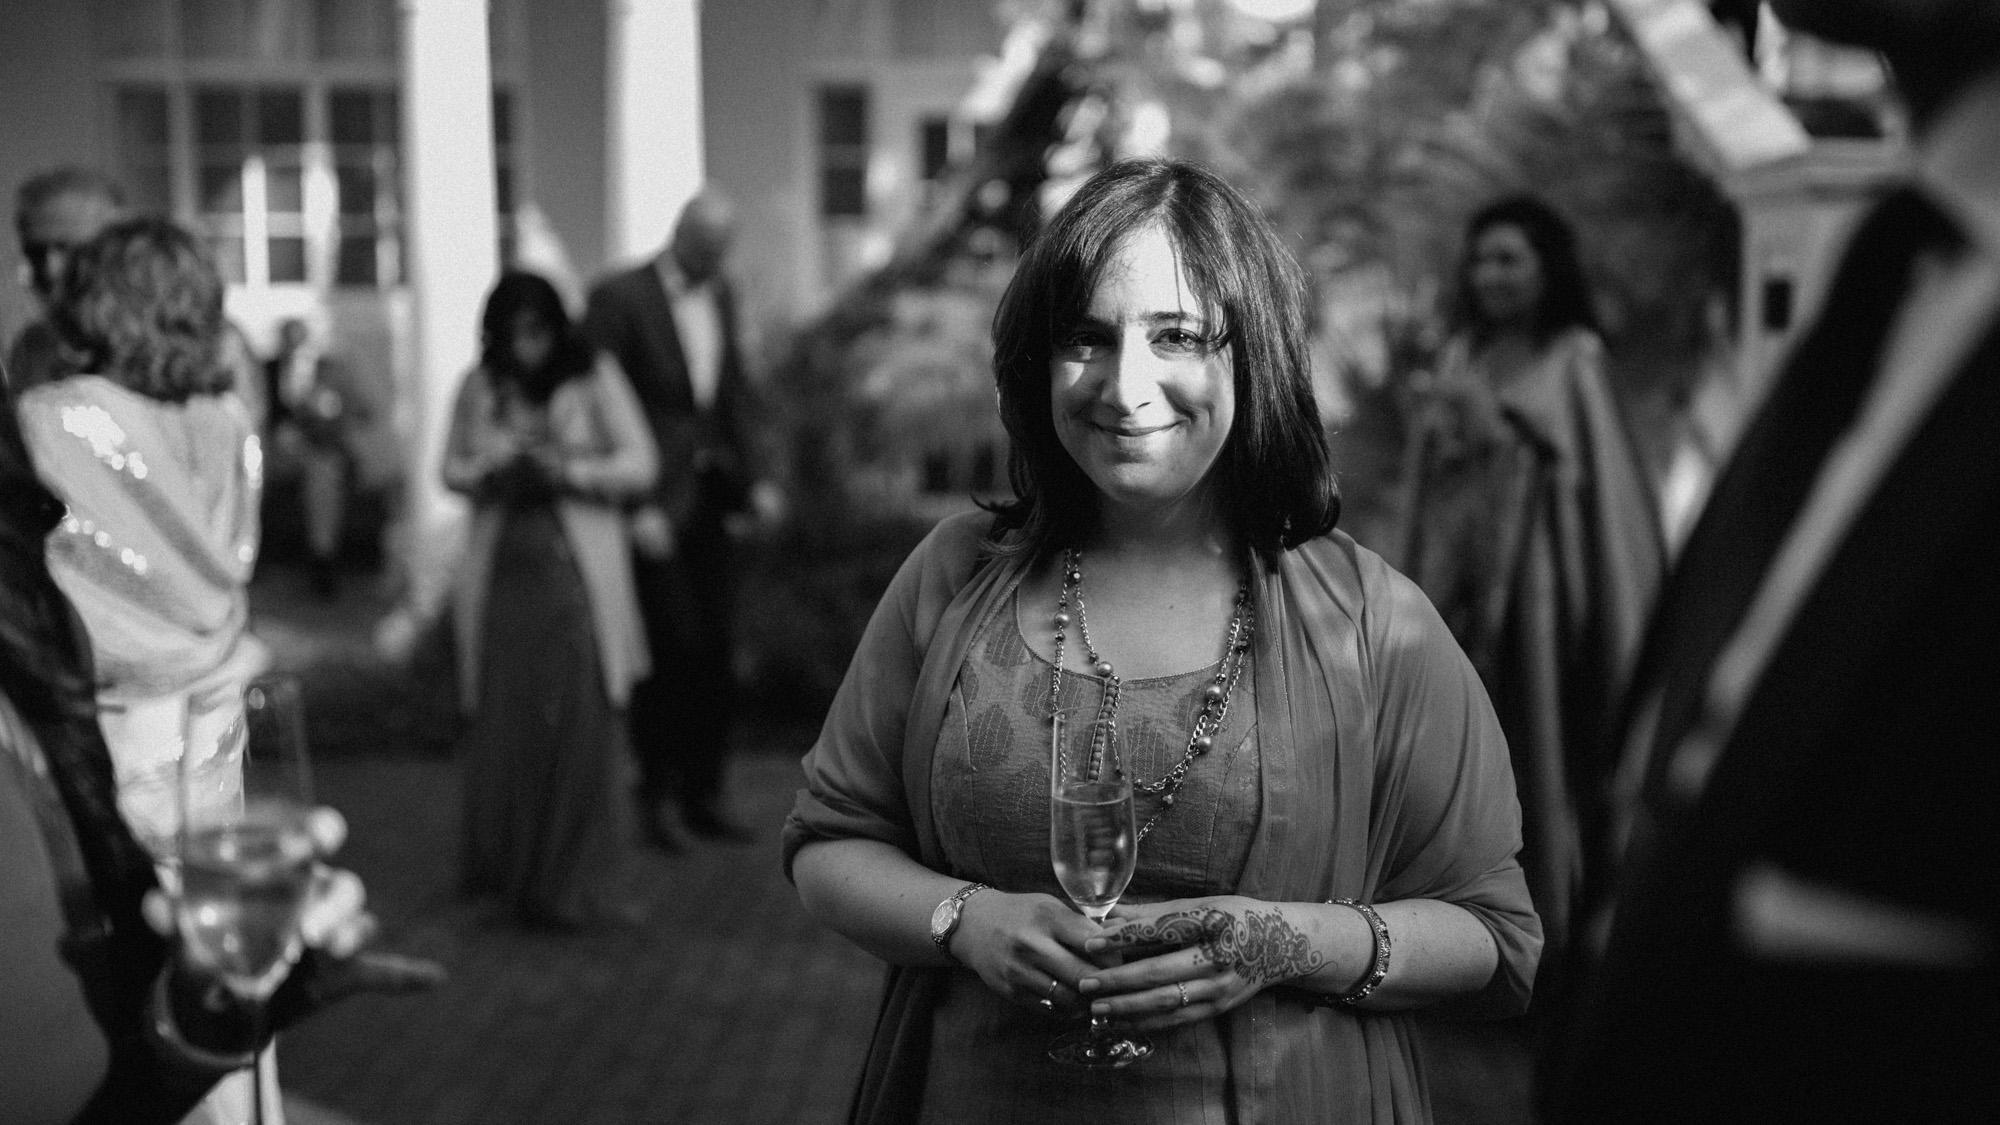 anu_maneesh_alec_vanderboom_Indian_wedding_photography-0123.jpg